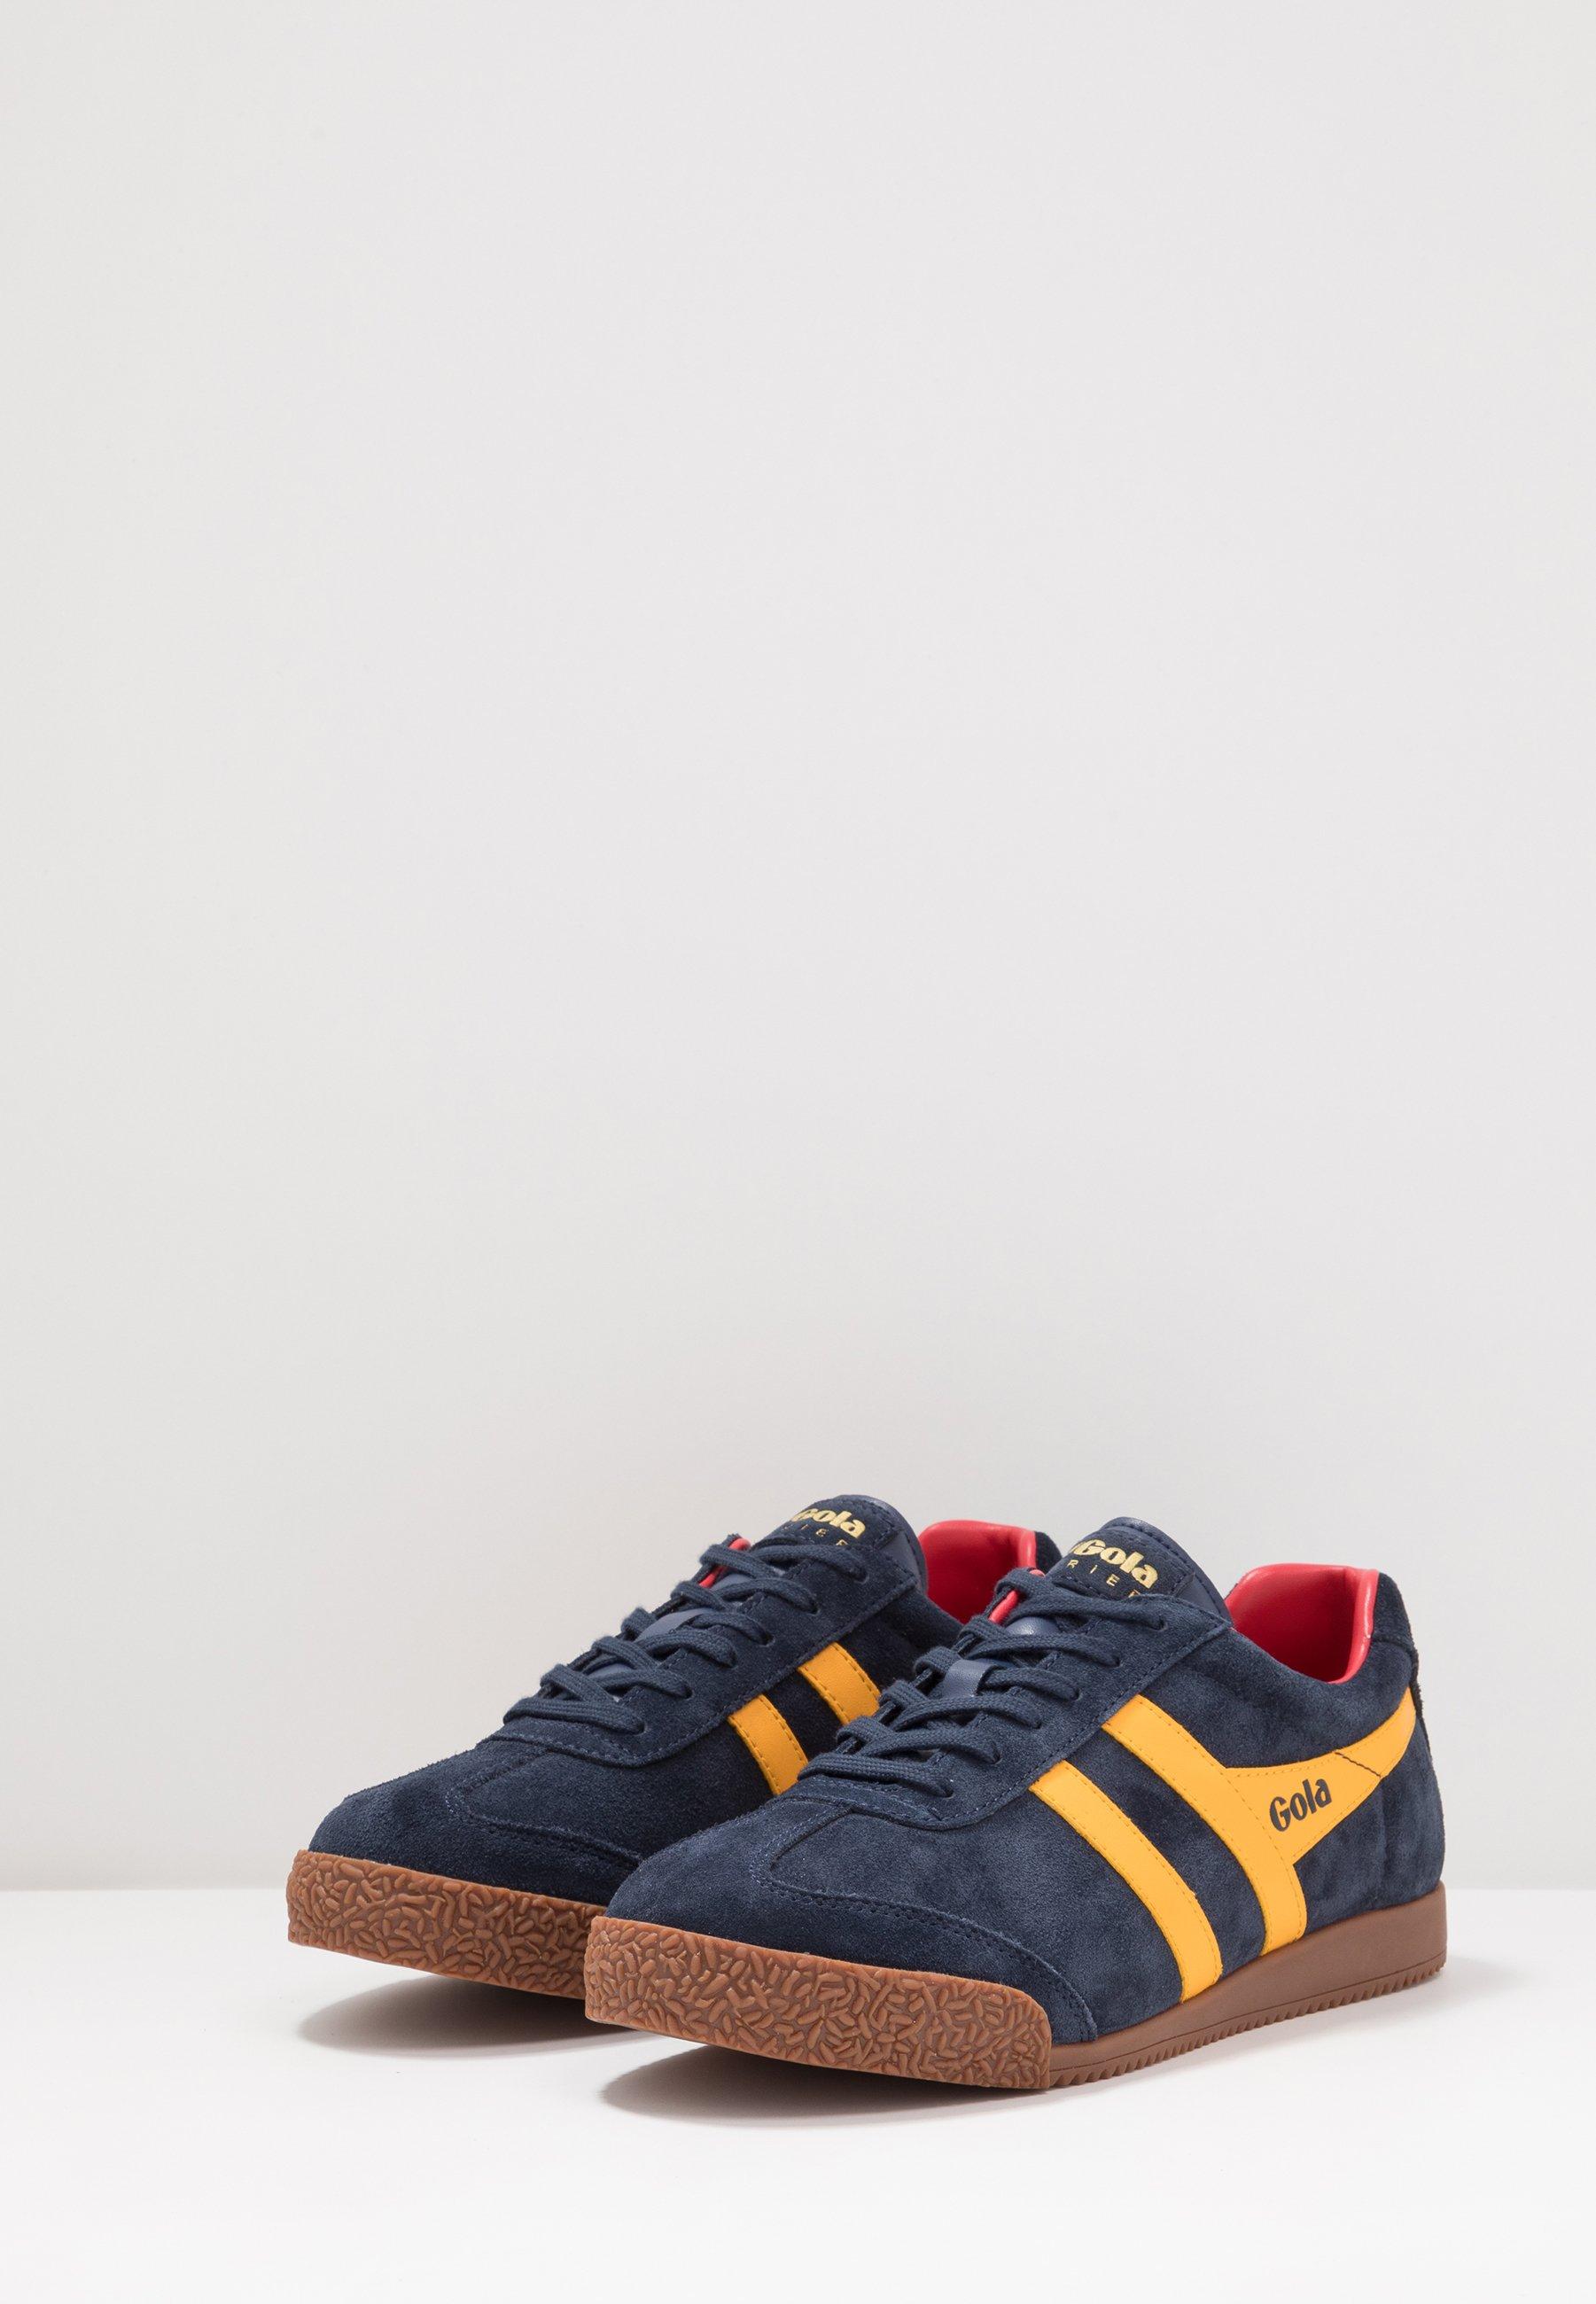 Gola HARRIER - Sneakers - navy/sun/red